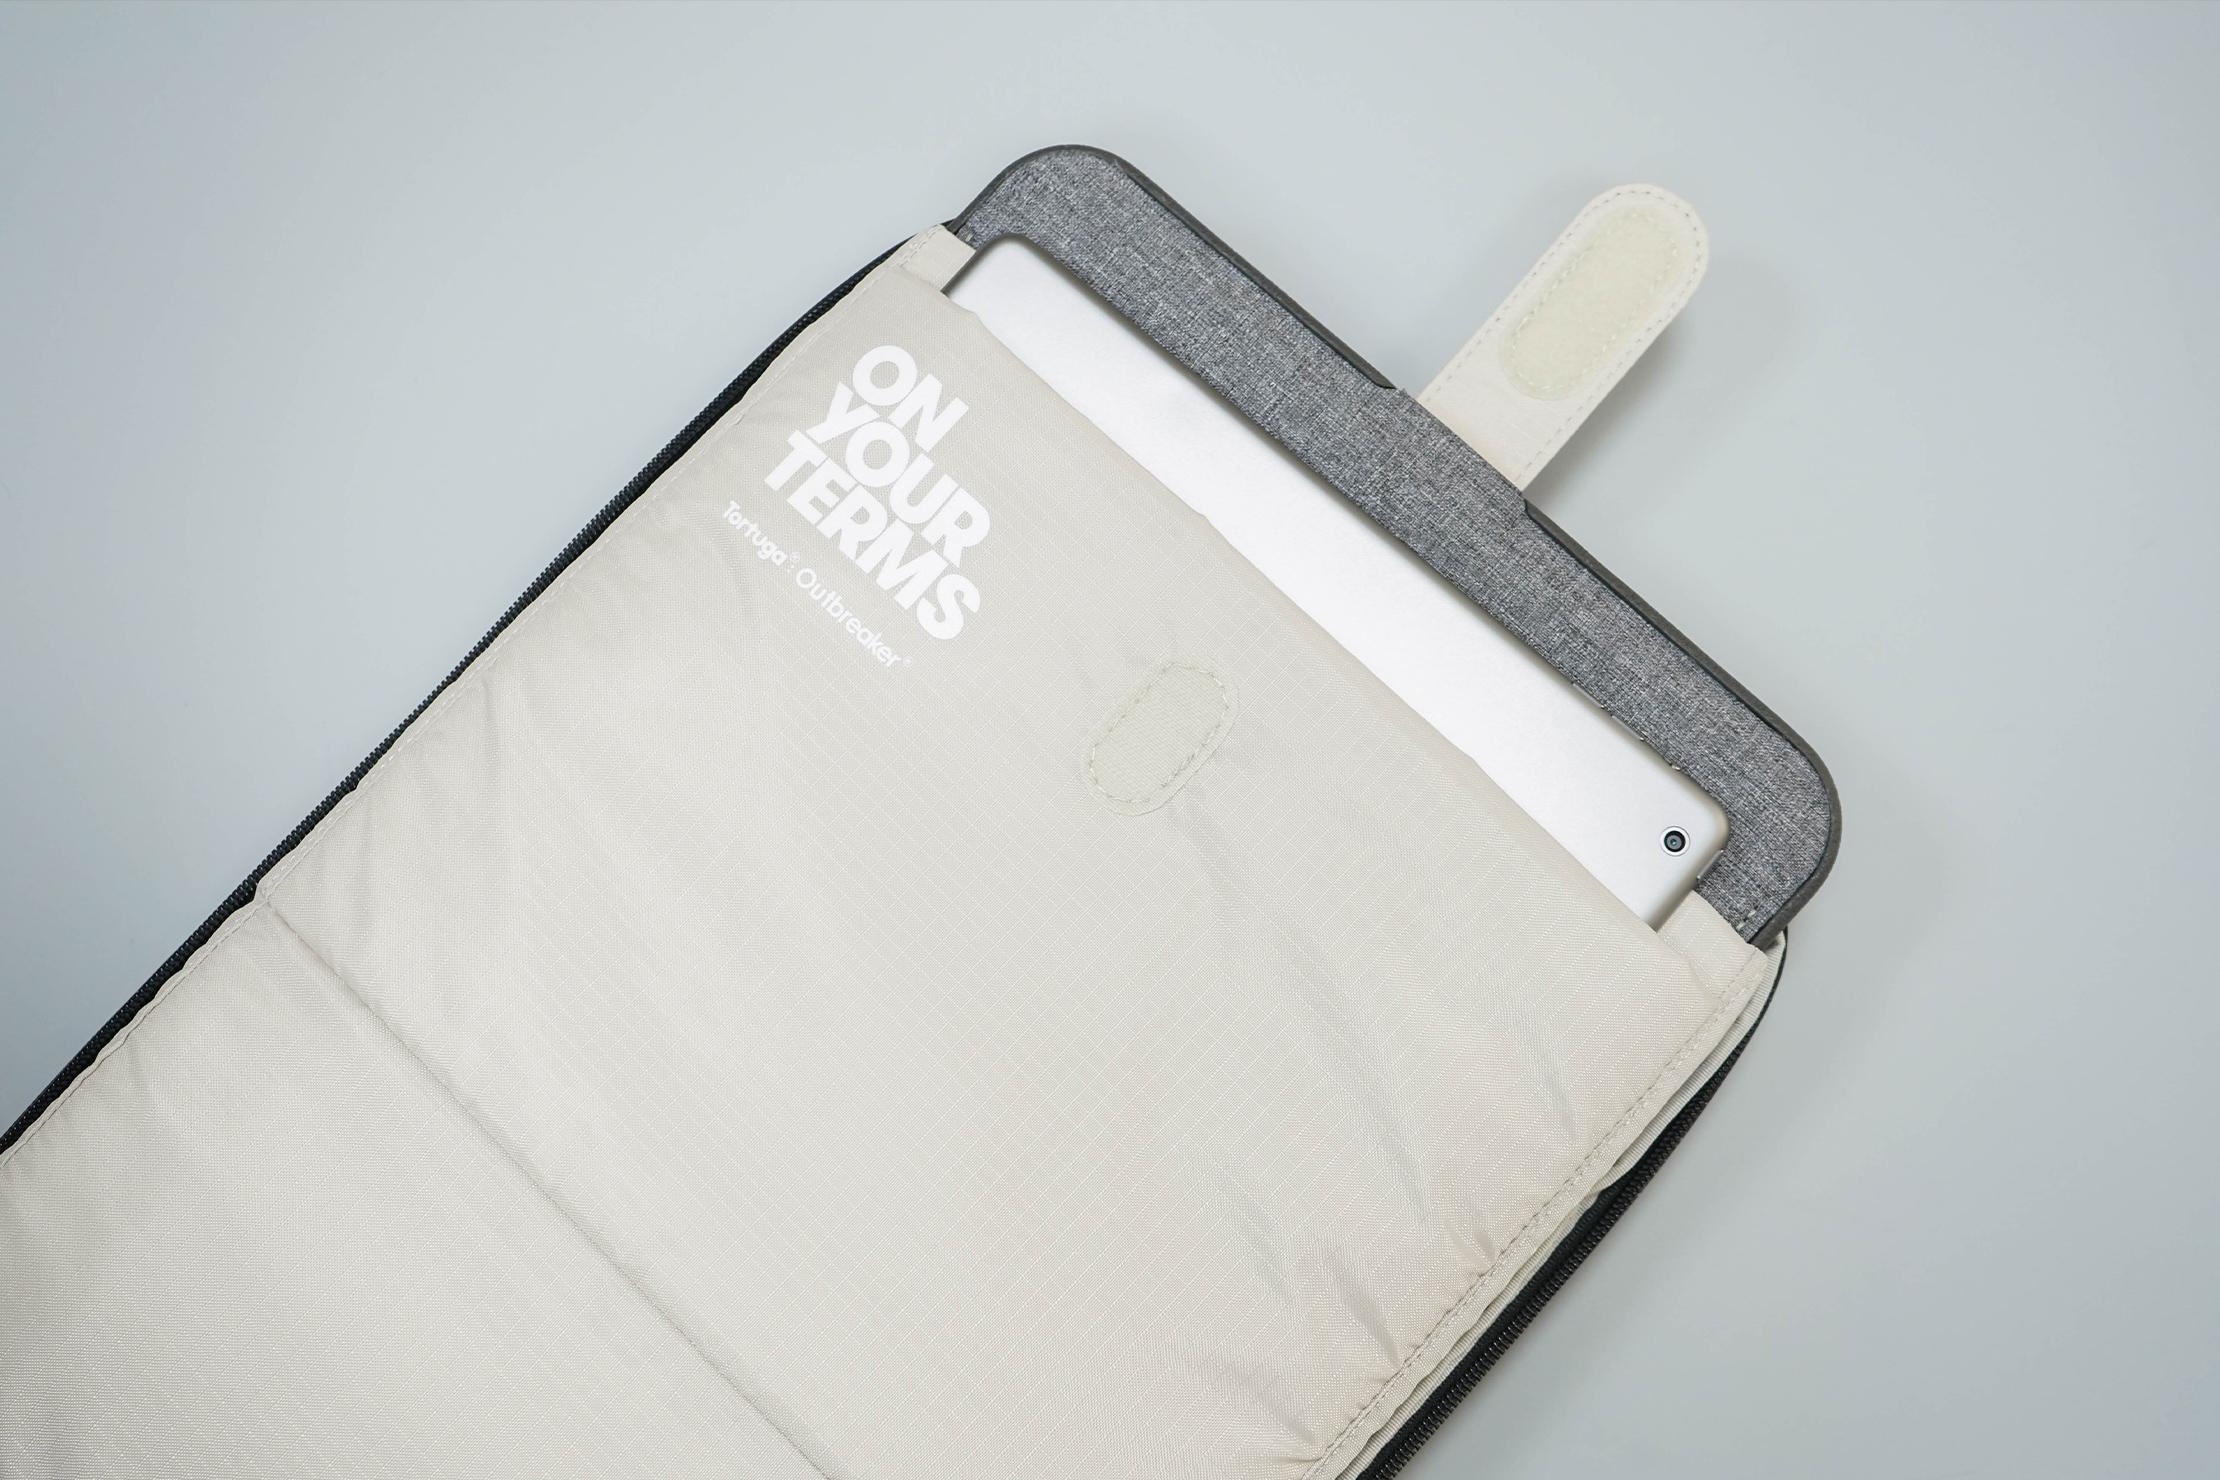 Tortuga Outbreaker Laptop Backpack Laptop Sleeve